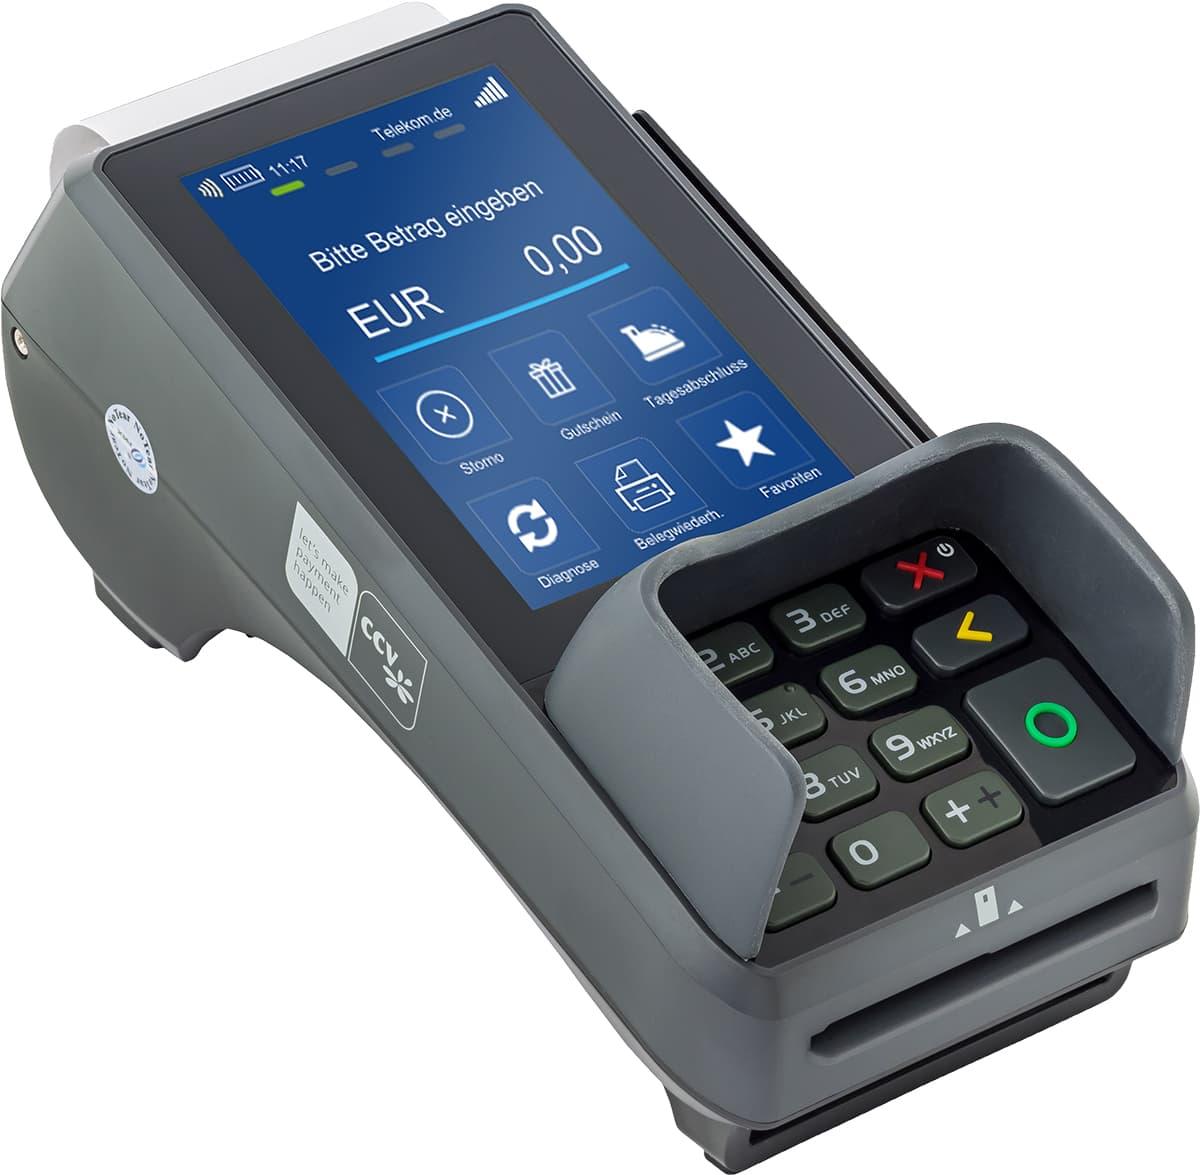 CCV Base Next - Touch Display an